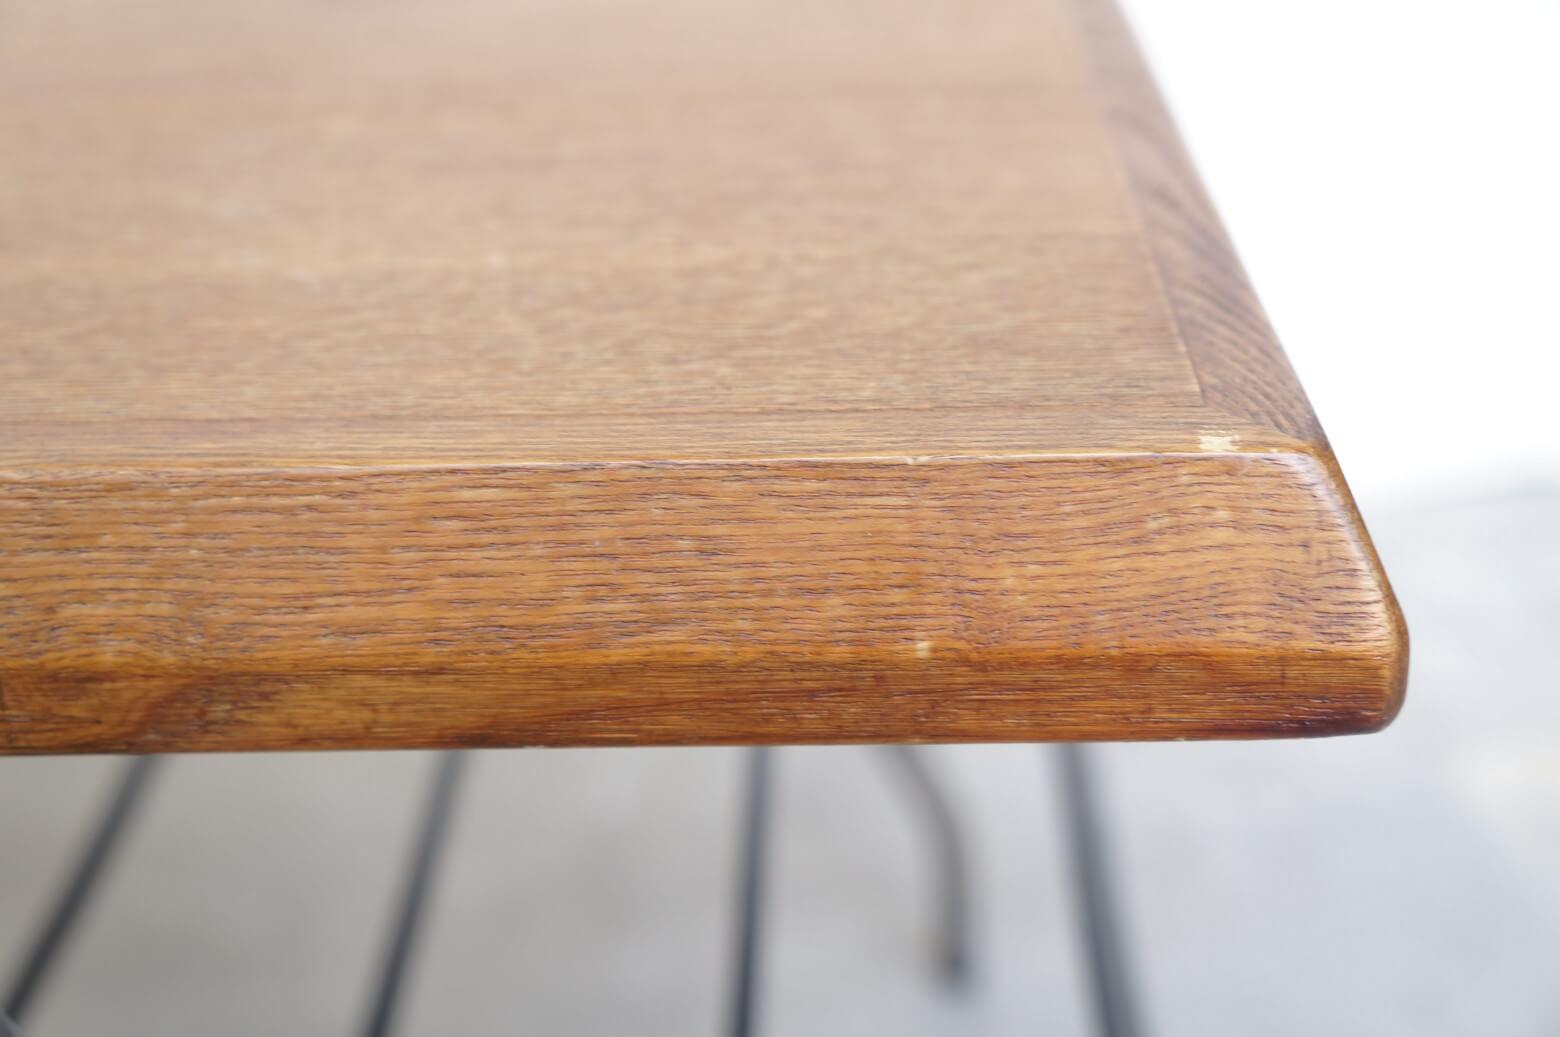 ACME Furniture BELLS FACTORY COFFEE TABLE SMALL 90cm / アクメ ファニチャー ベルズ ファクトリー コーヒーテーブル